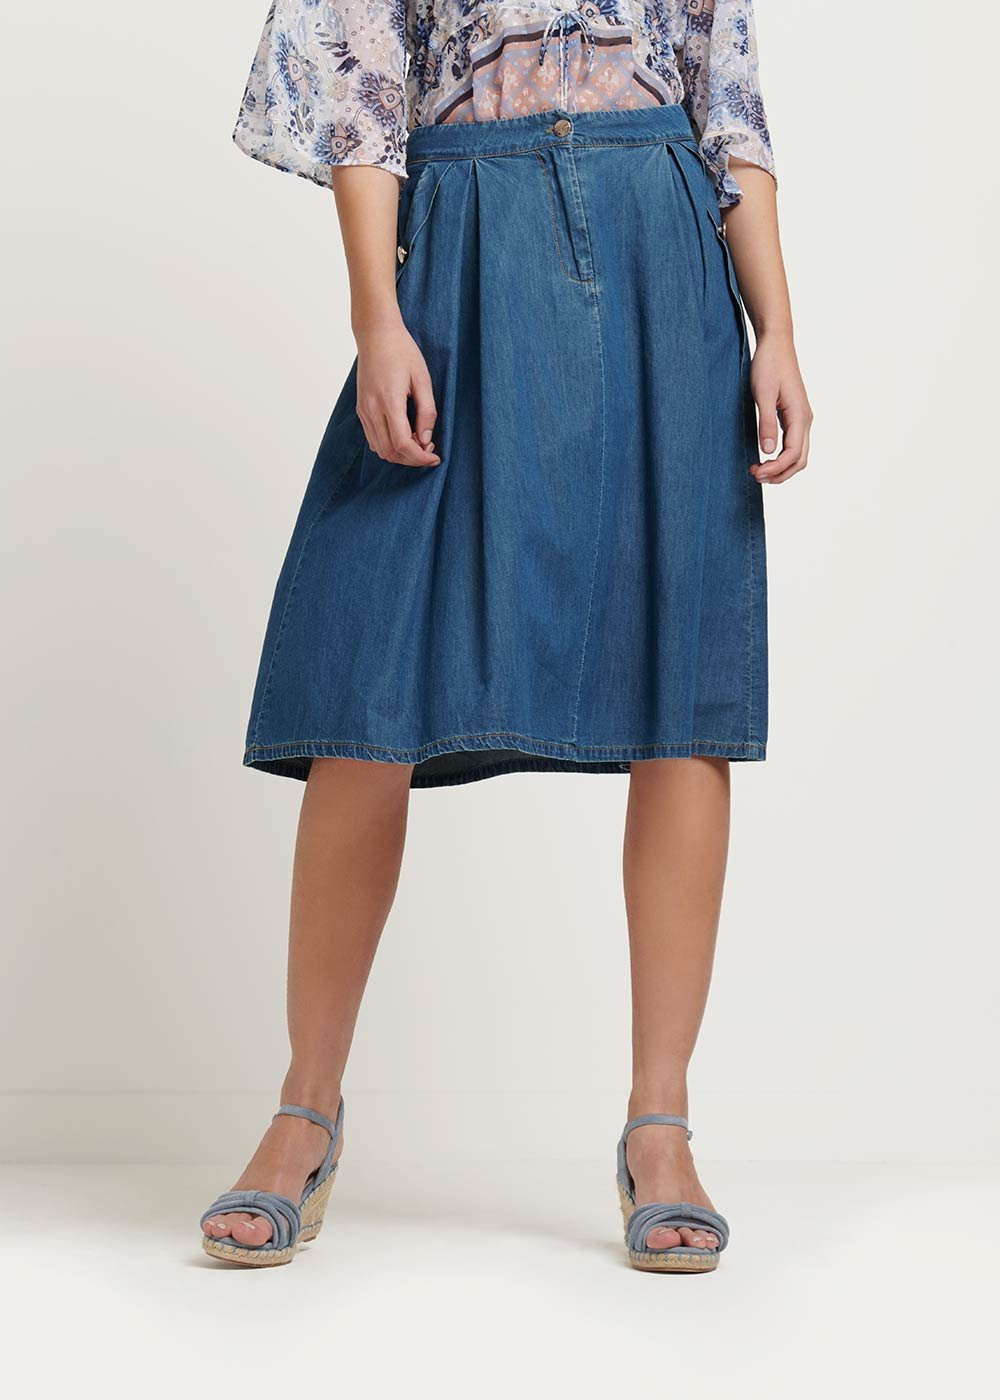 Glenda denim cotton skirt - Denim - Woman